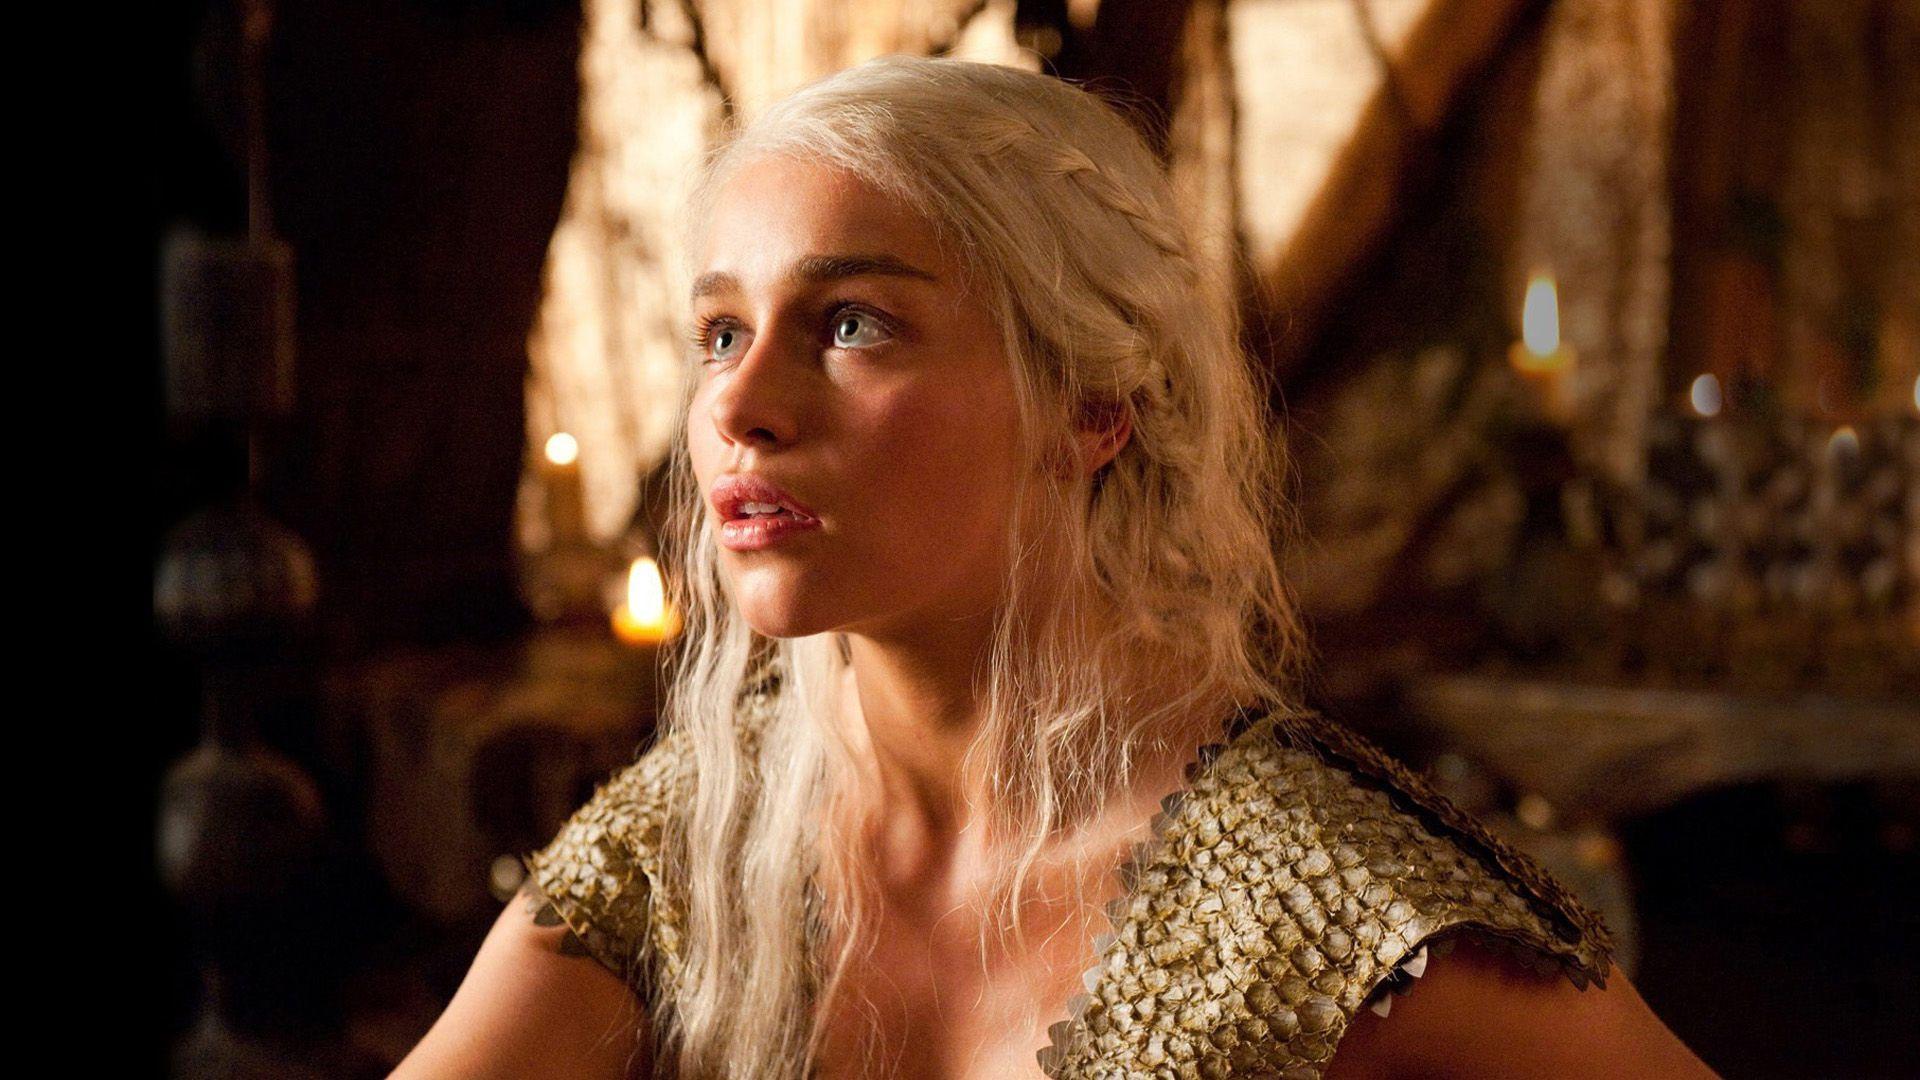 Daenerys Targaryen Wallpapers Wallpaper Cave